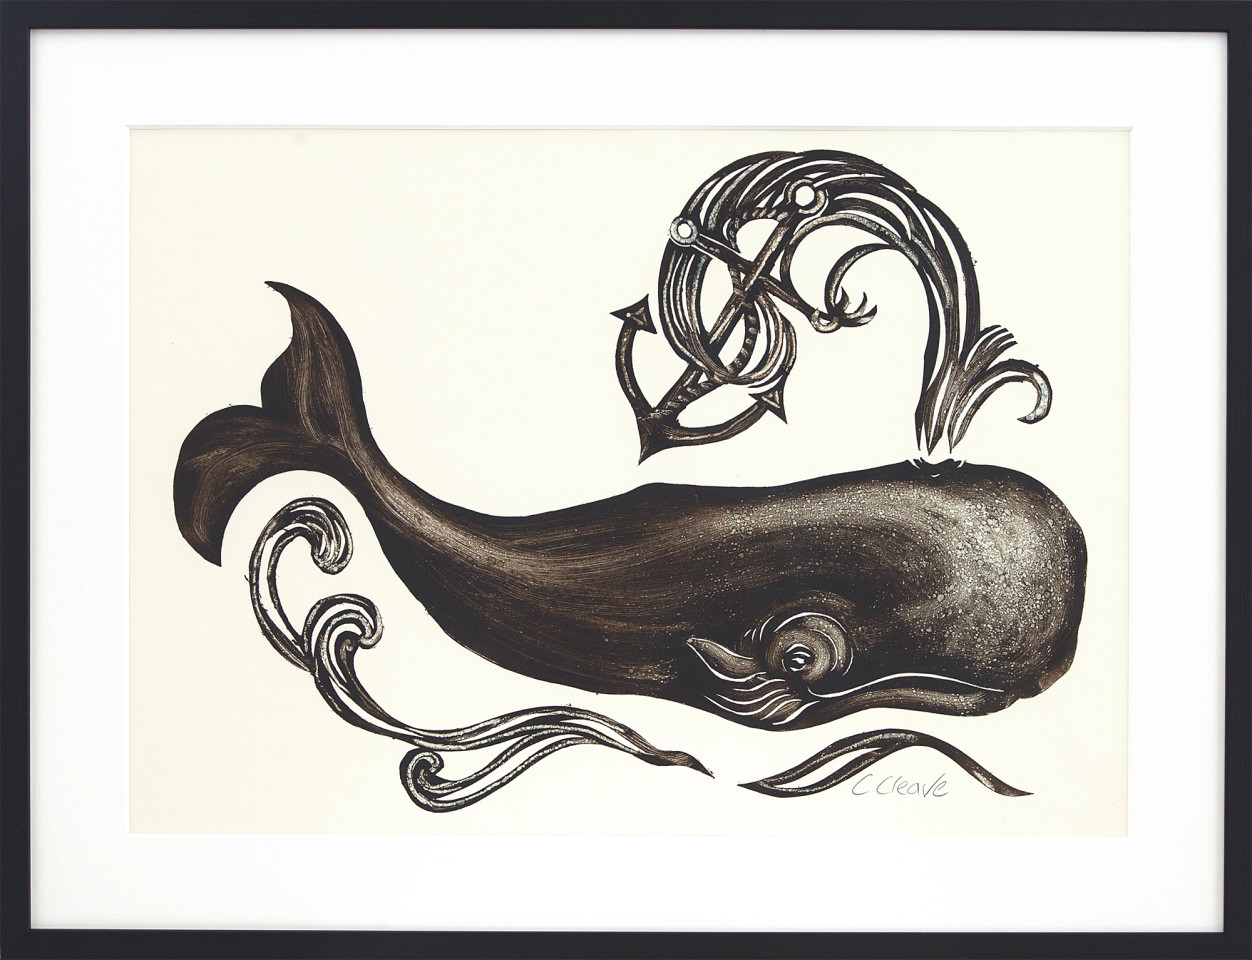 Caroline Cleave, Whale